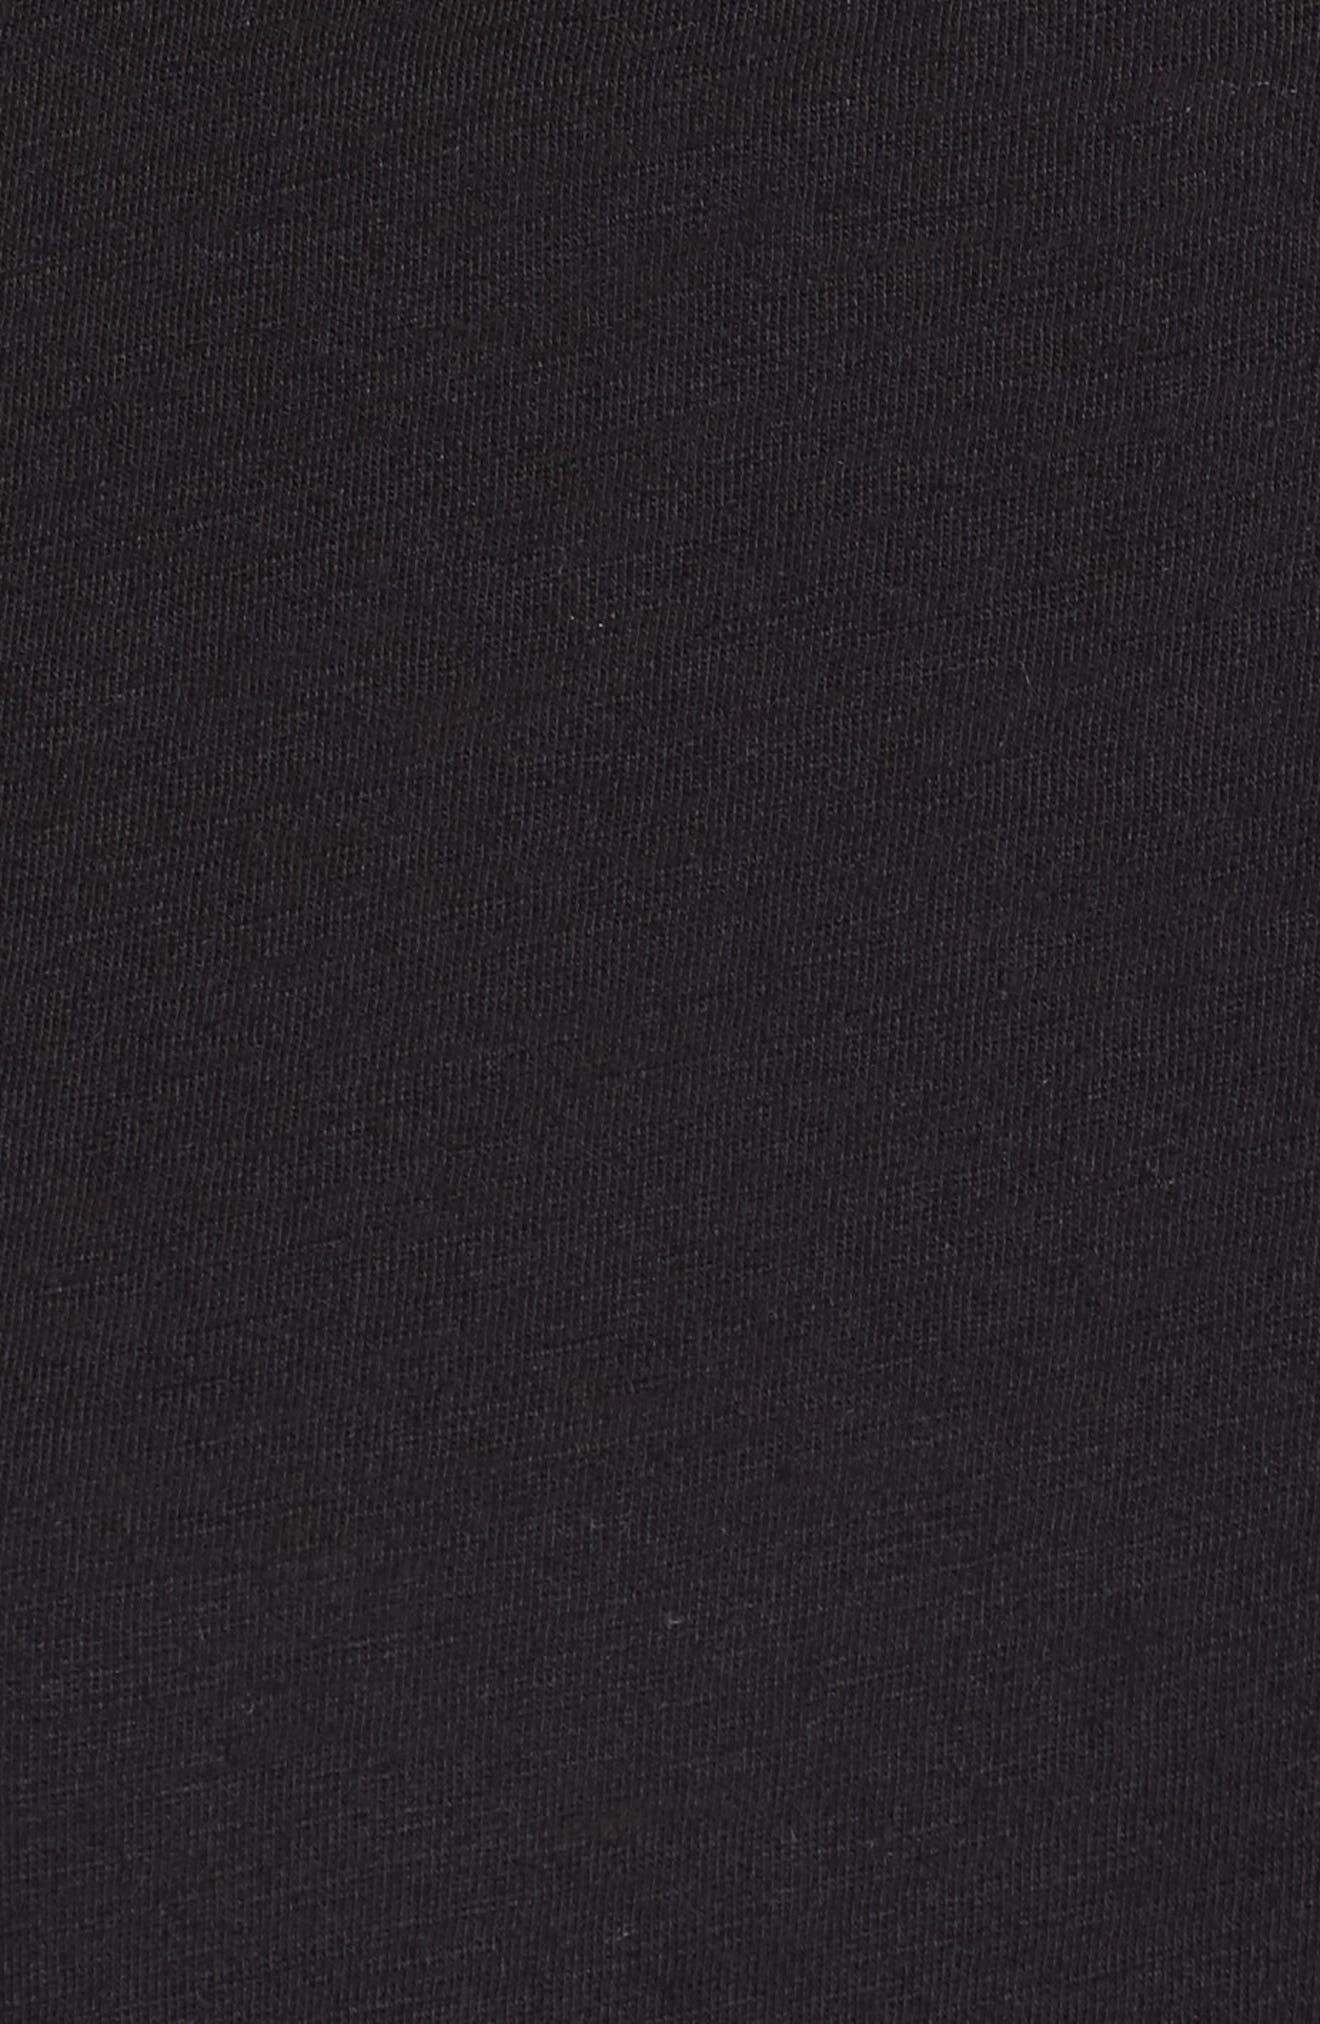 One-Shoulder Tie Tee,                             Alternate thumbnail 5, color,                             Black